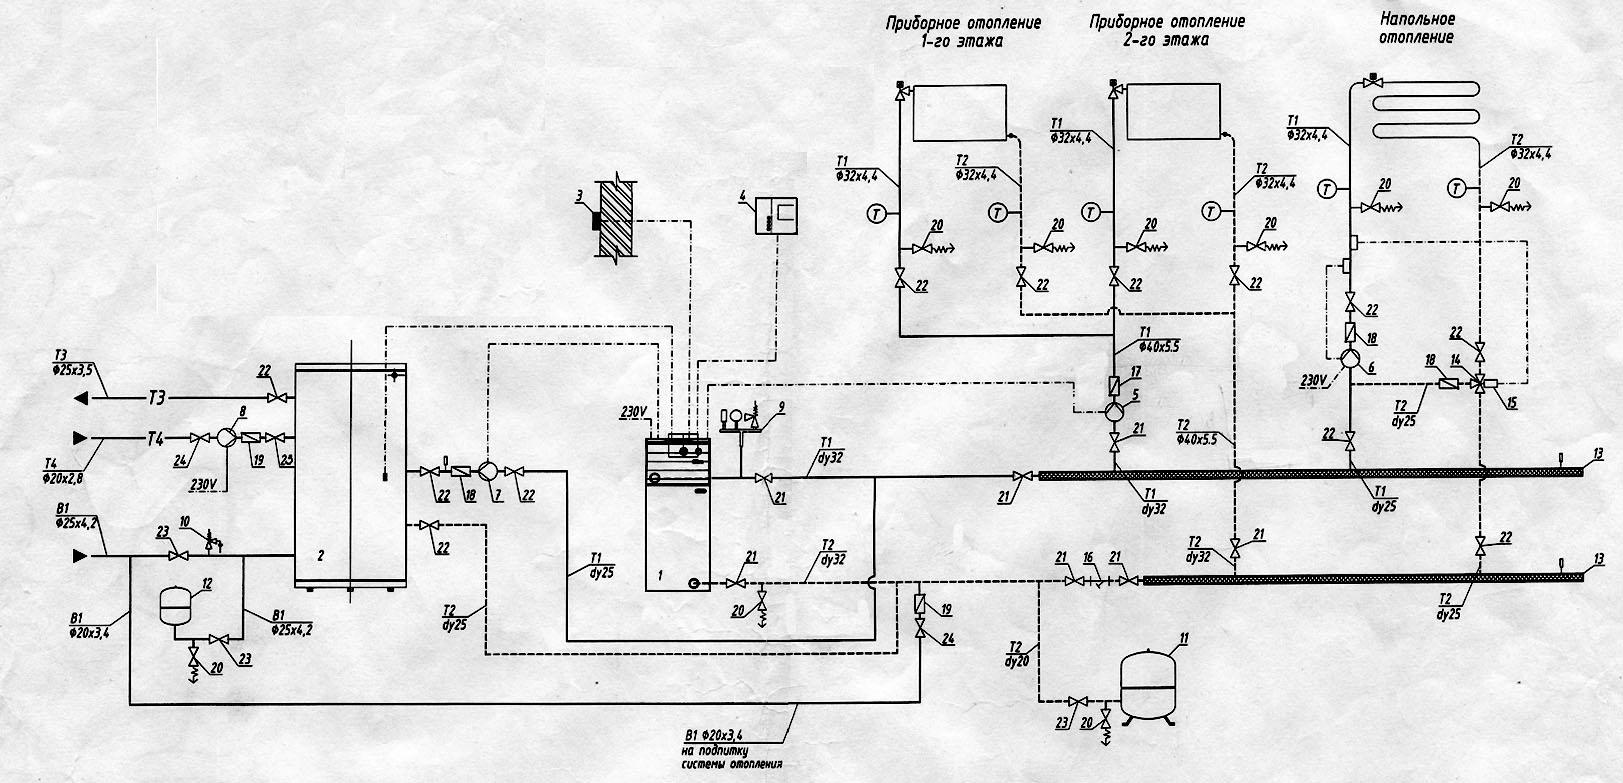 Электрическая схема привода спидометра уаз.